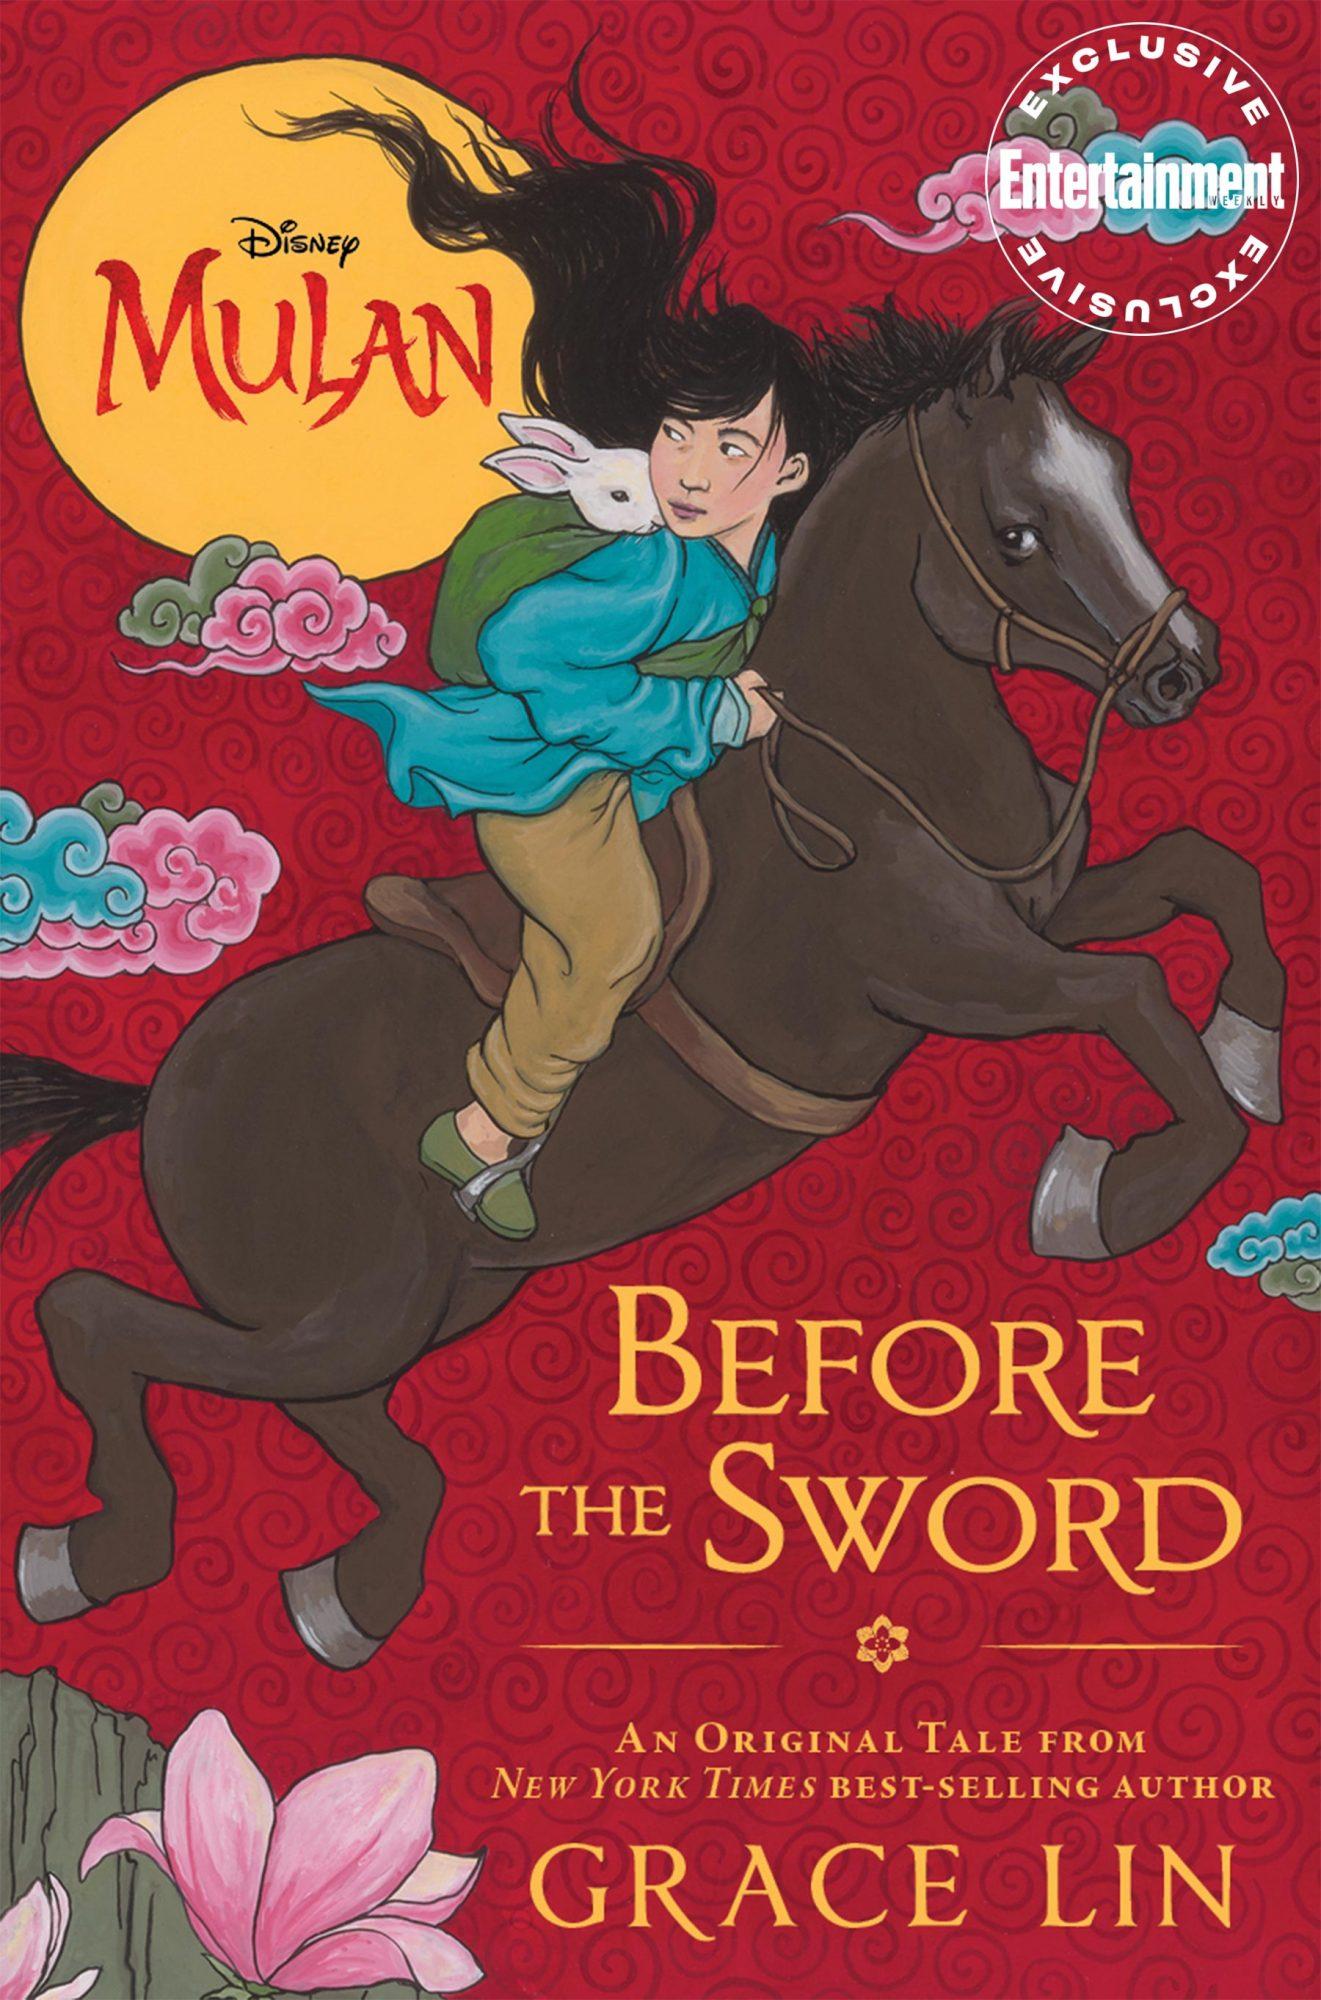 Mulan Before the Sword by Grace Lin CR: Disney